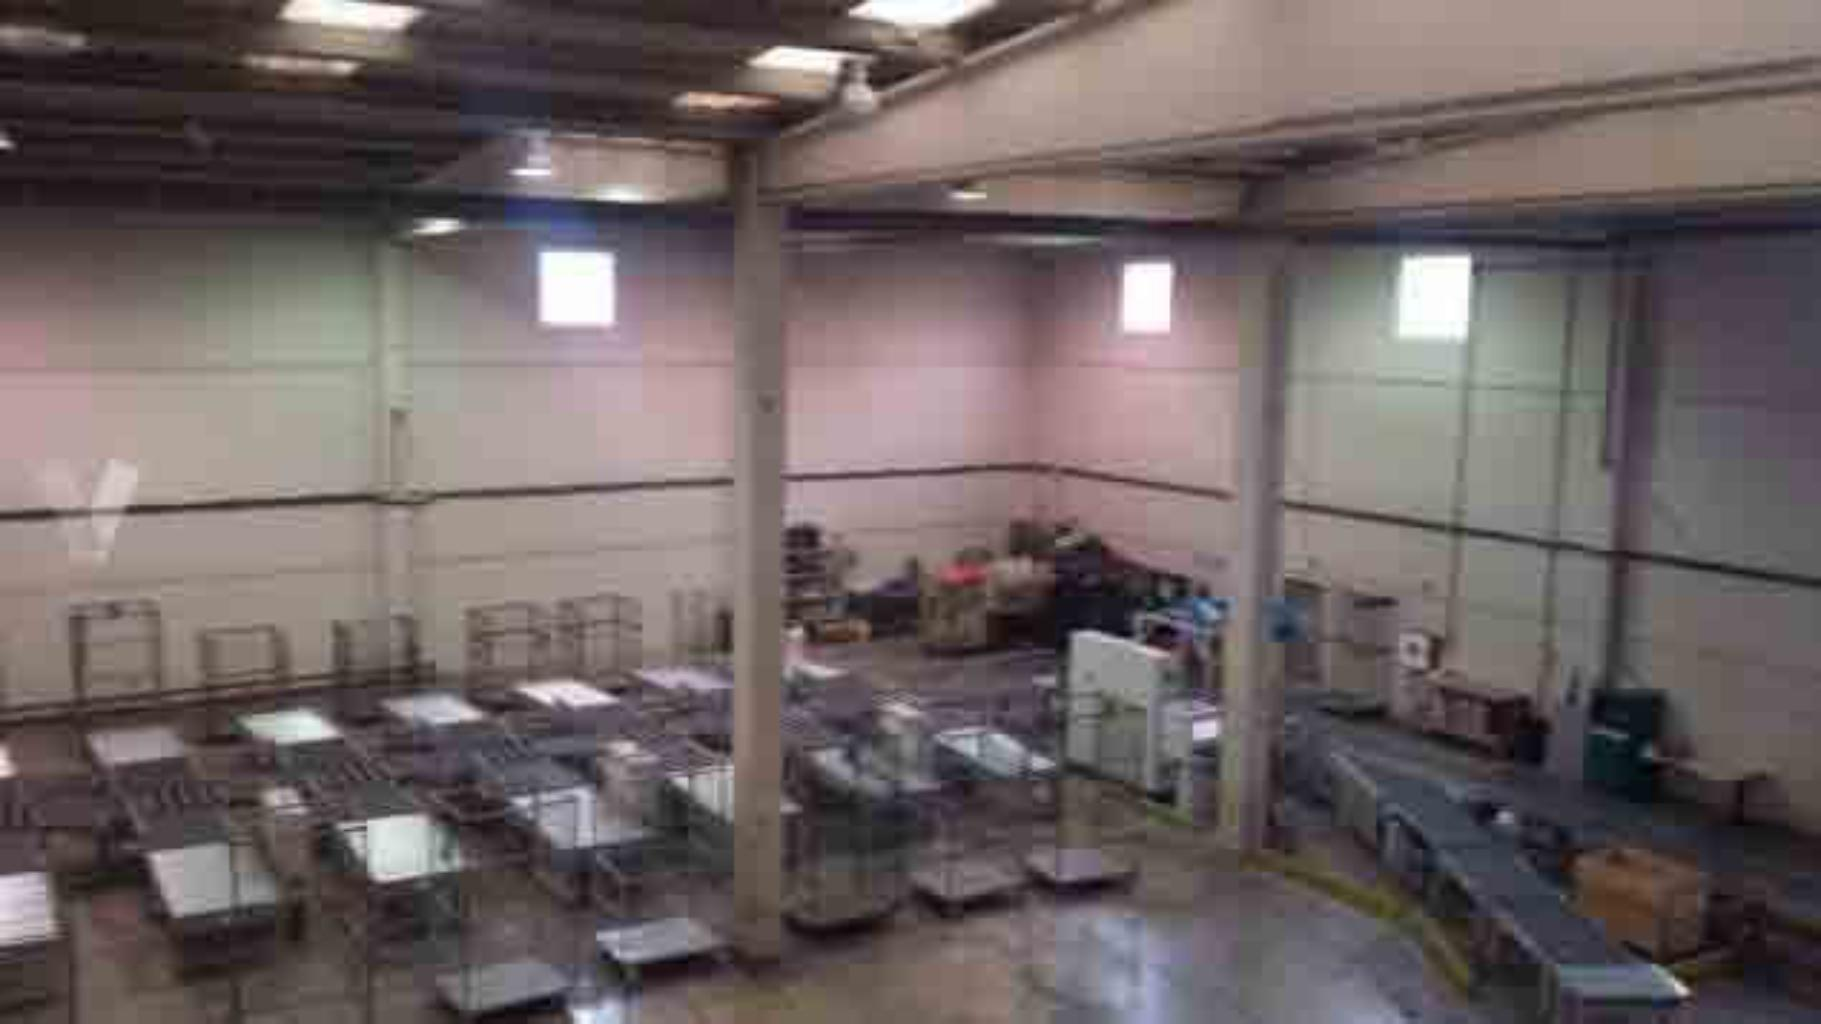 Nave industrial alquiler barbera del vall s nci asesores - Alquiler furgonetas barbera del valles ...